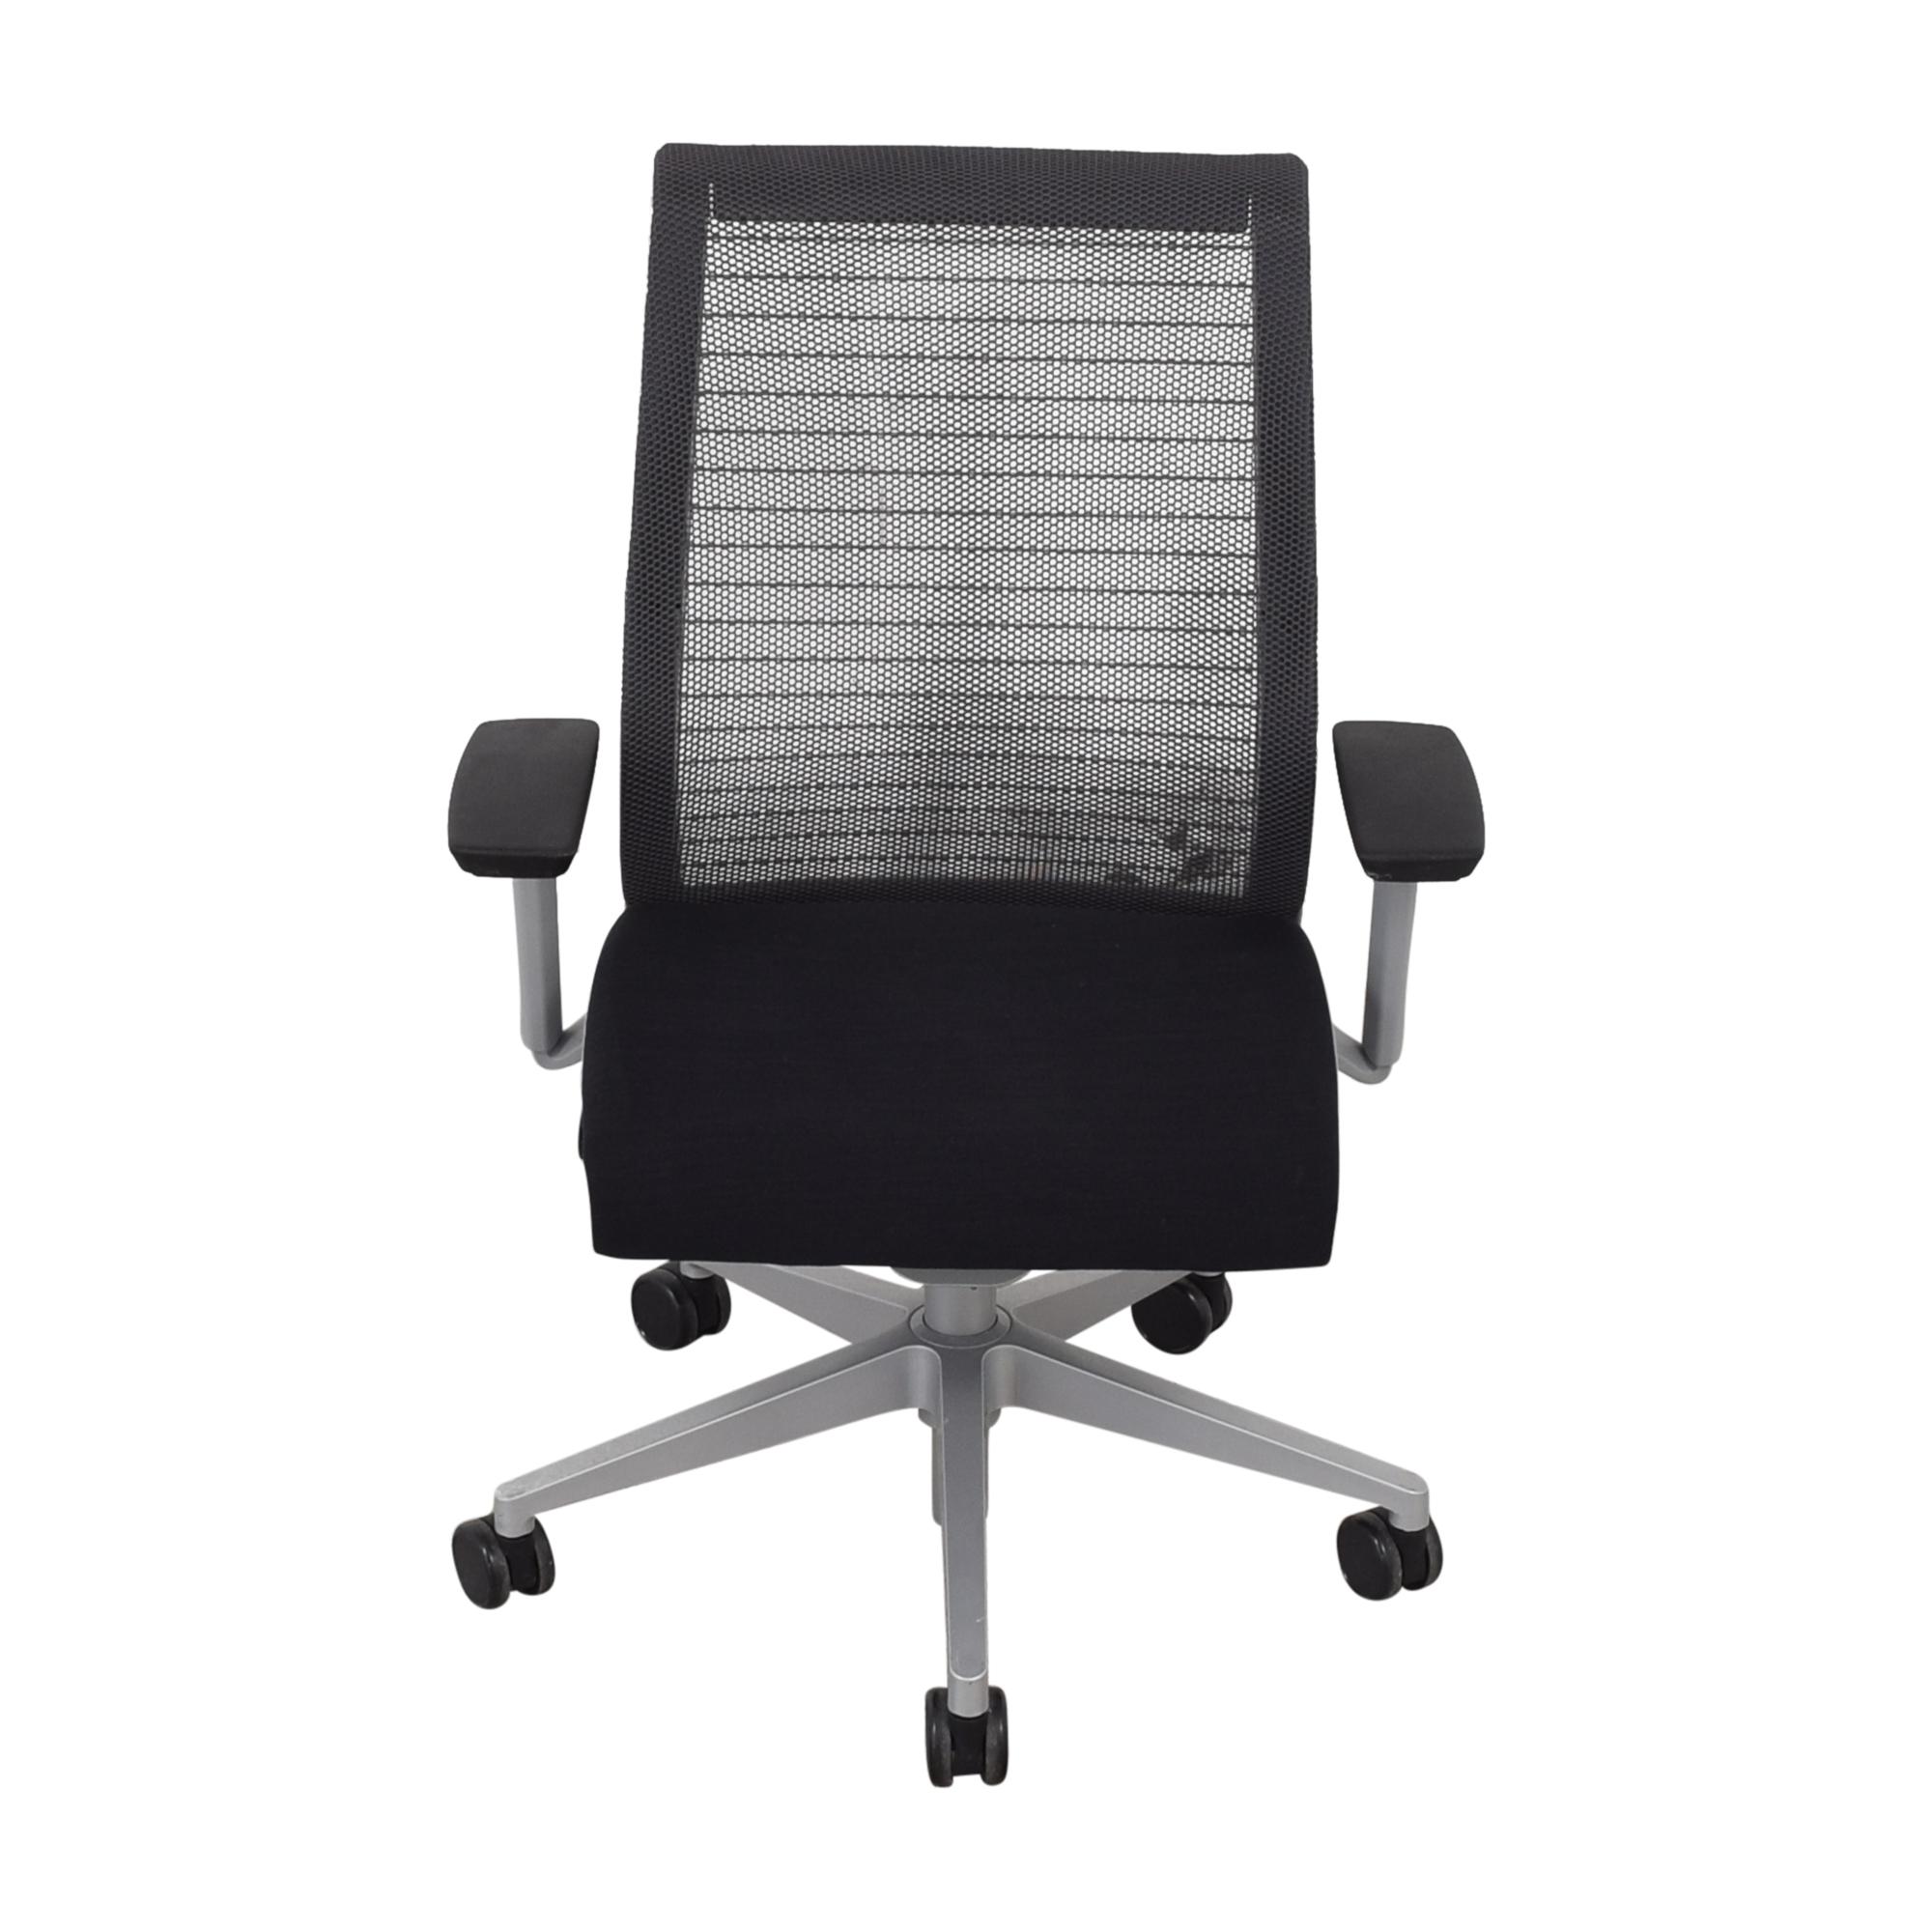 Steelcase Steelcase Cobi Swivel Chair price